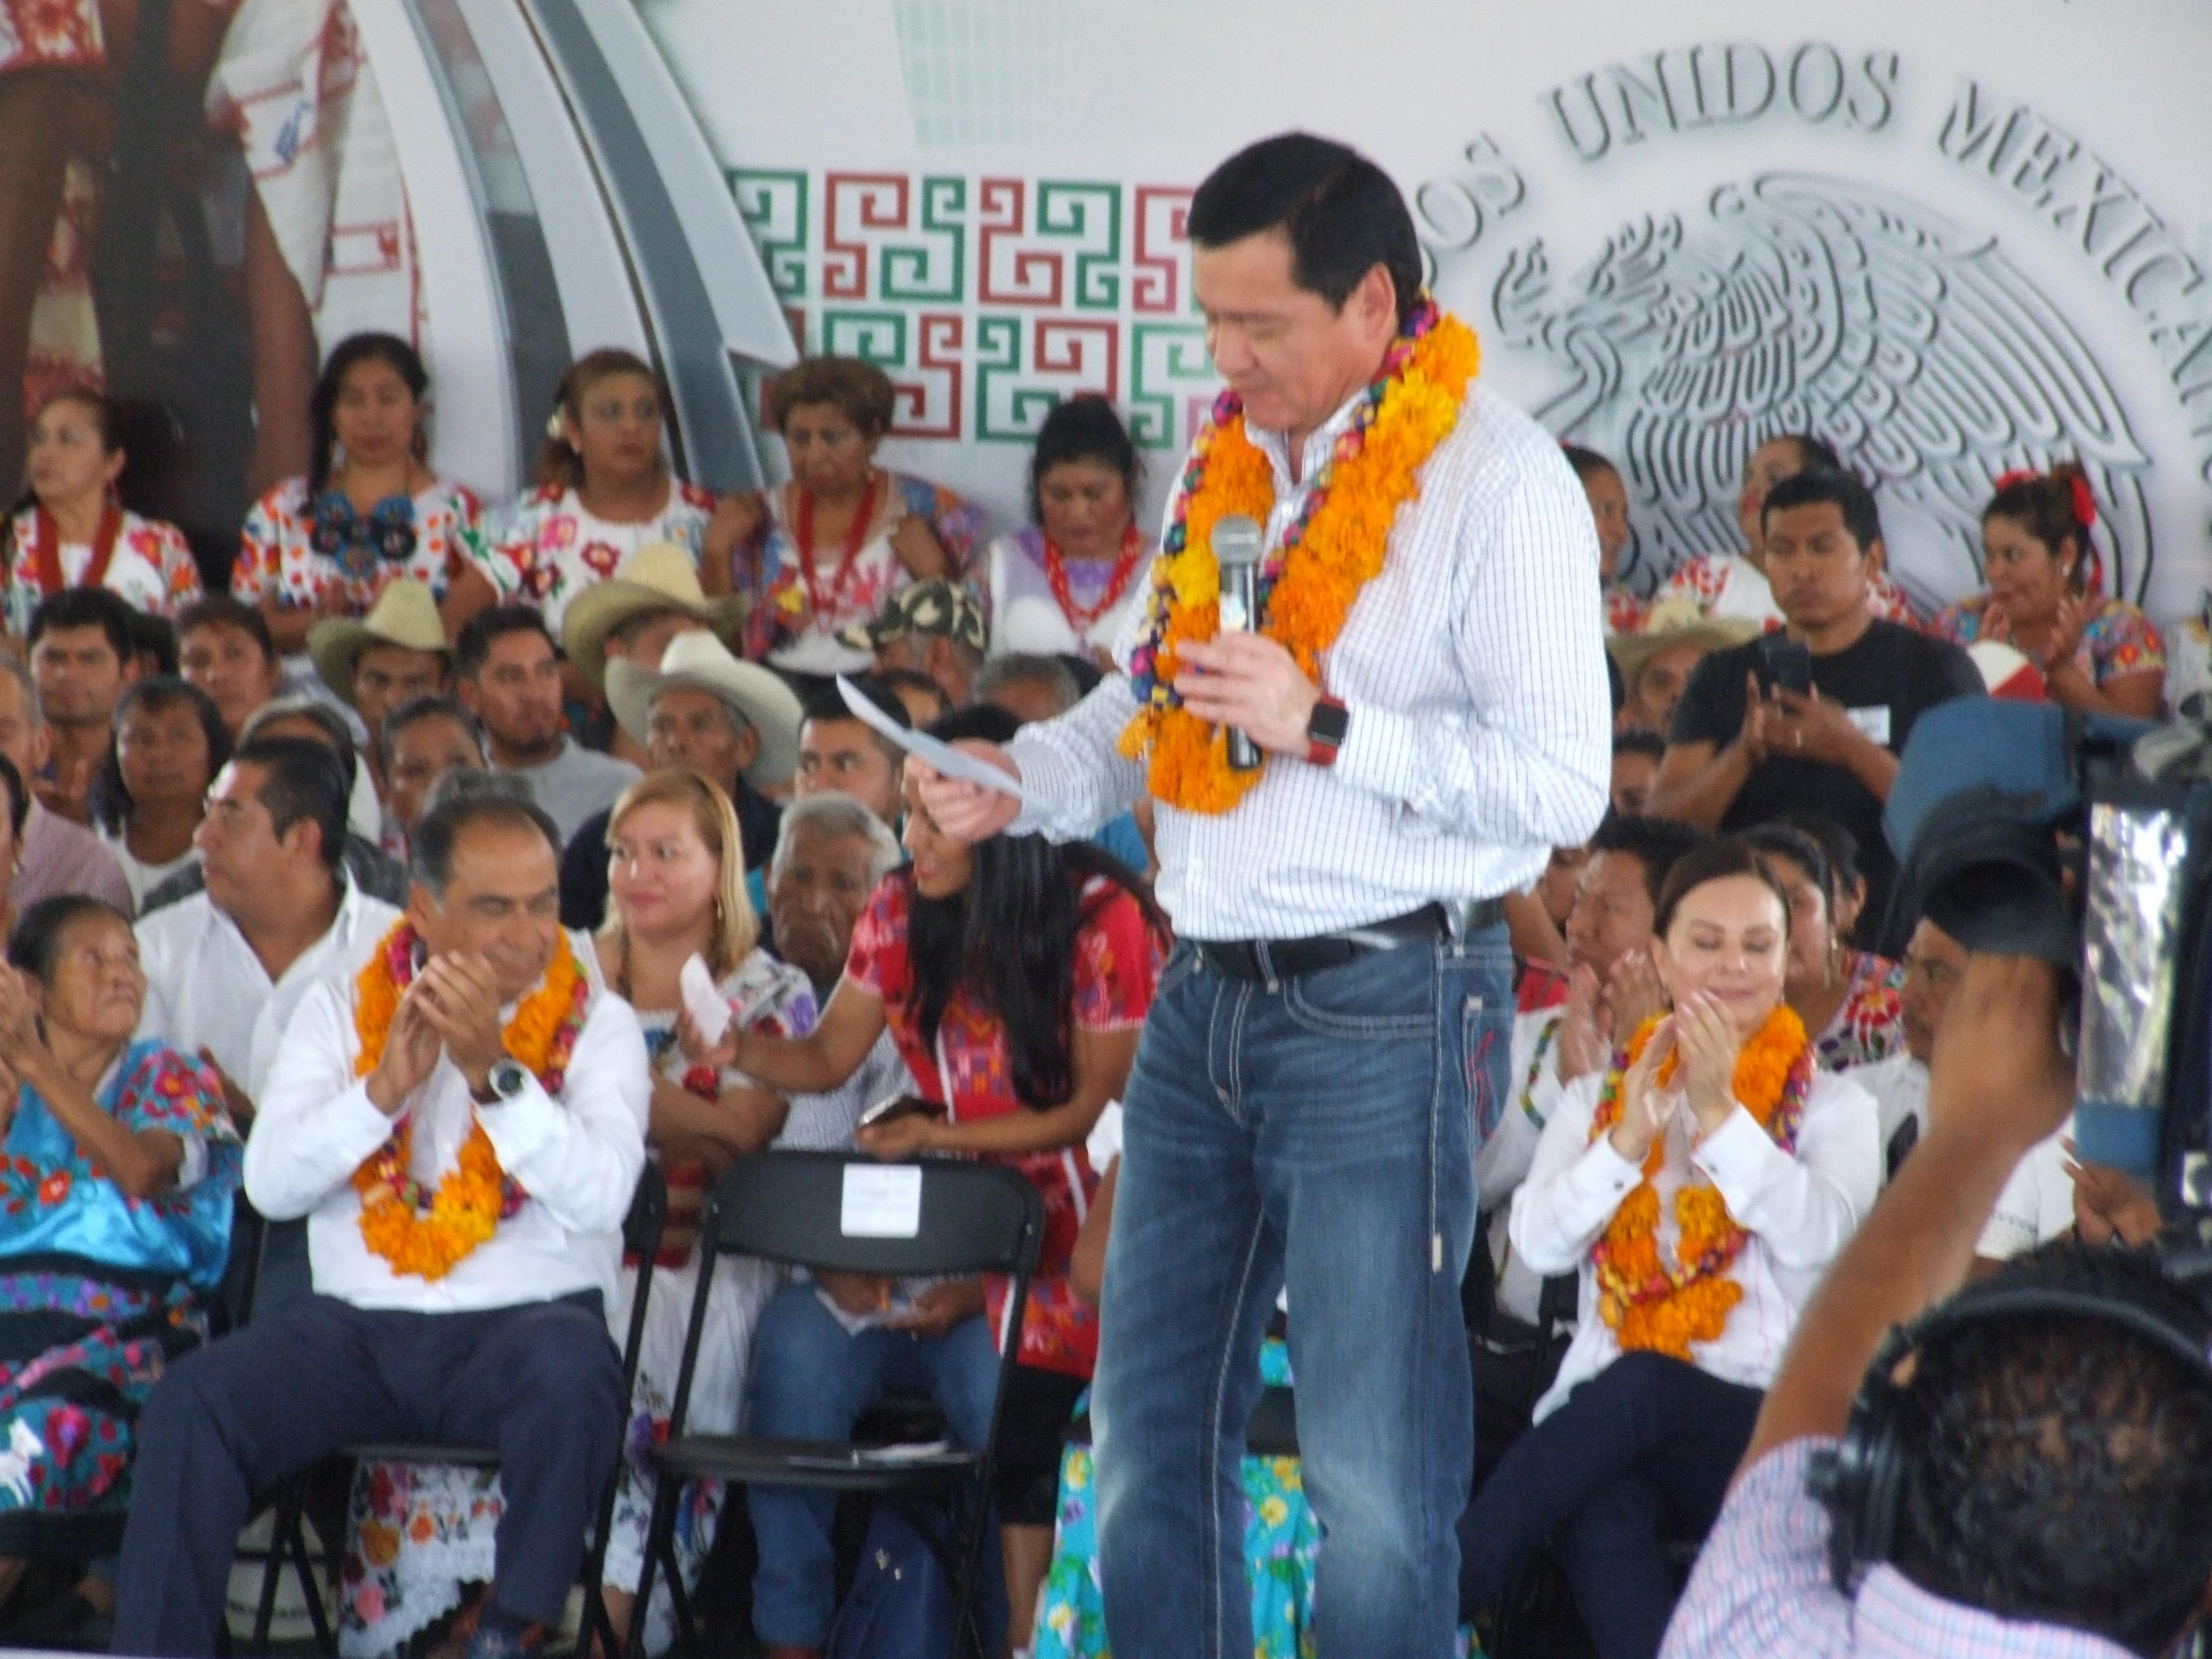 Osorio Chong, Tlapa